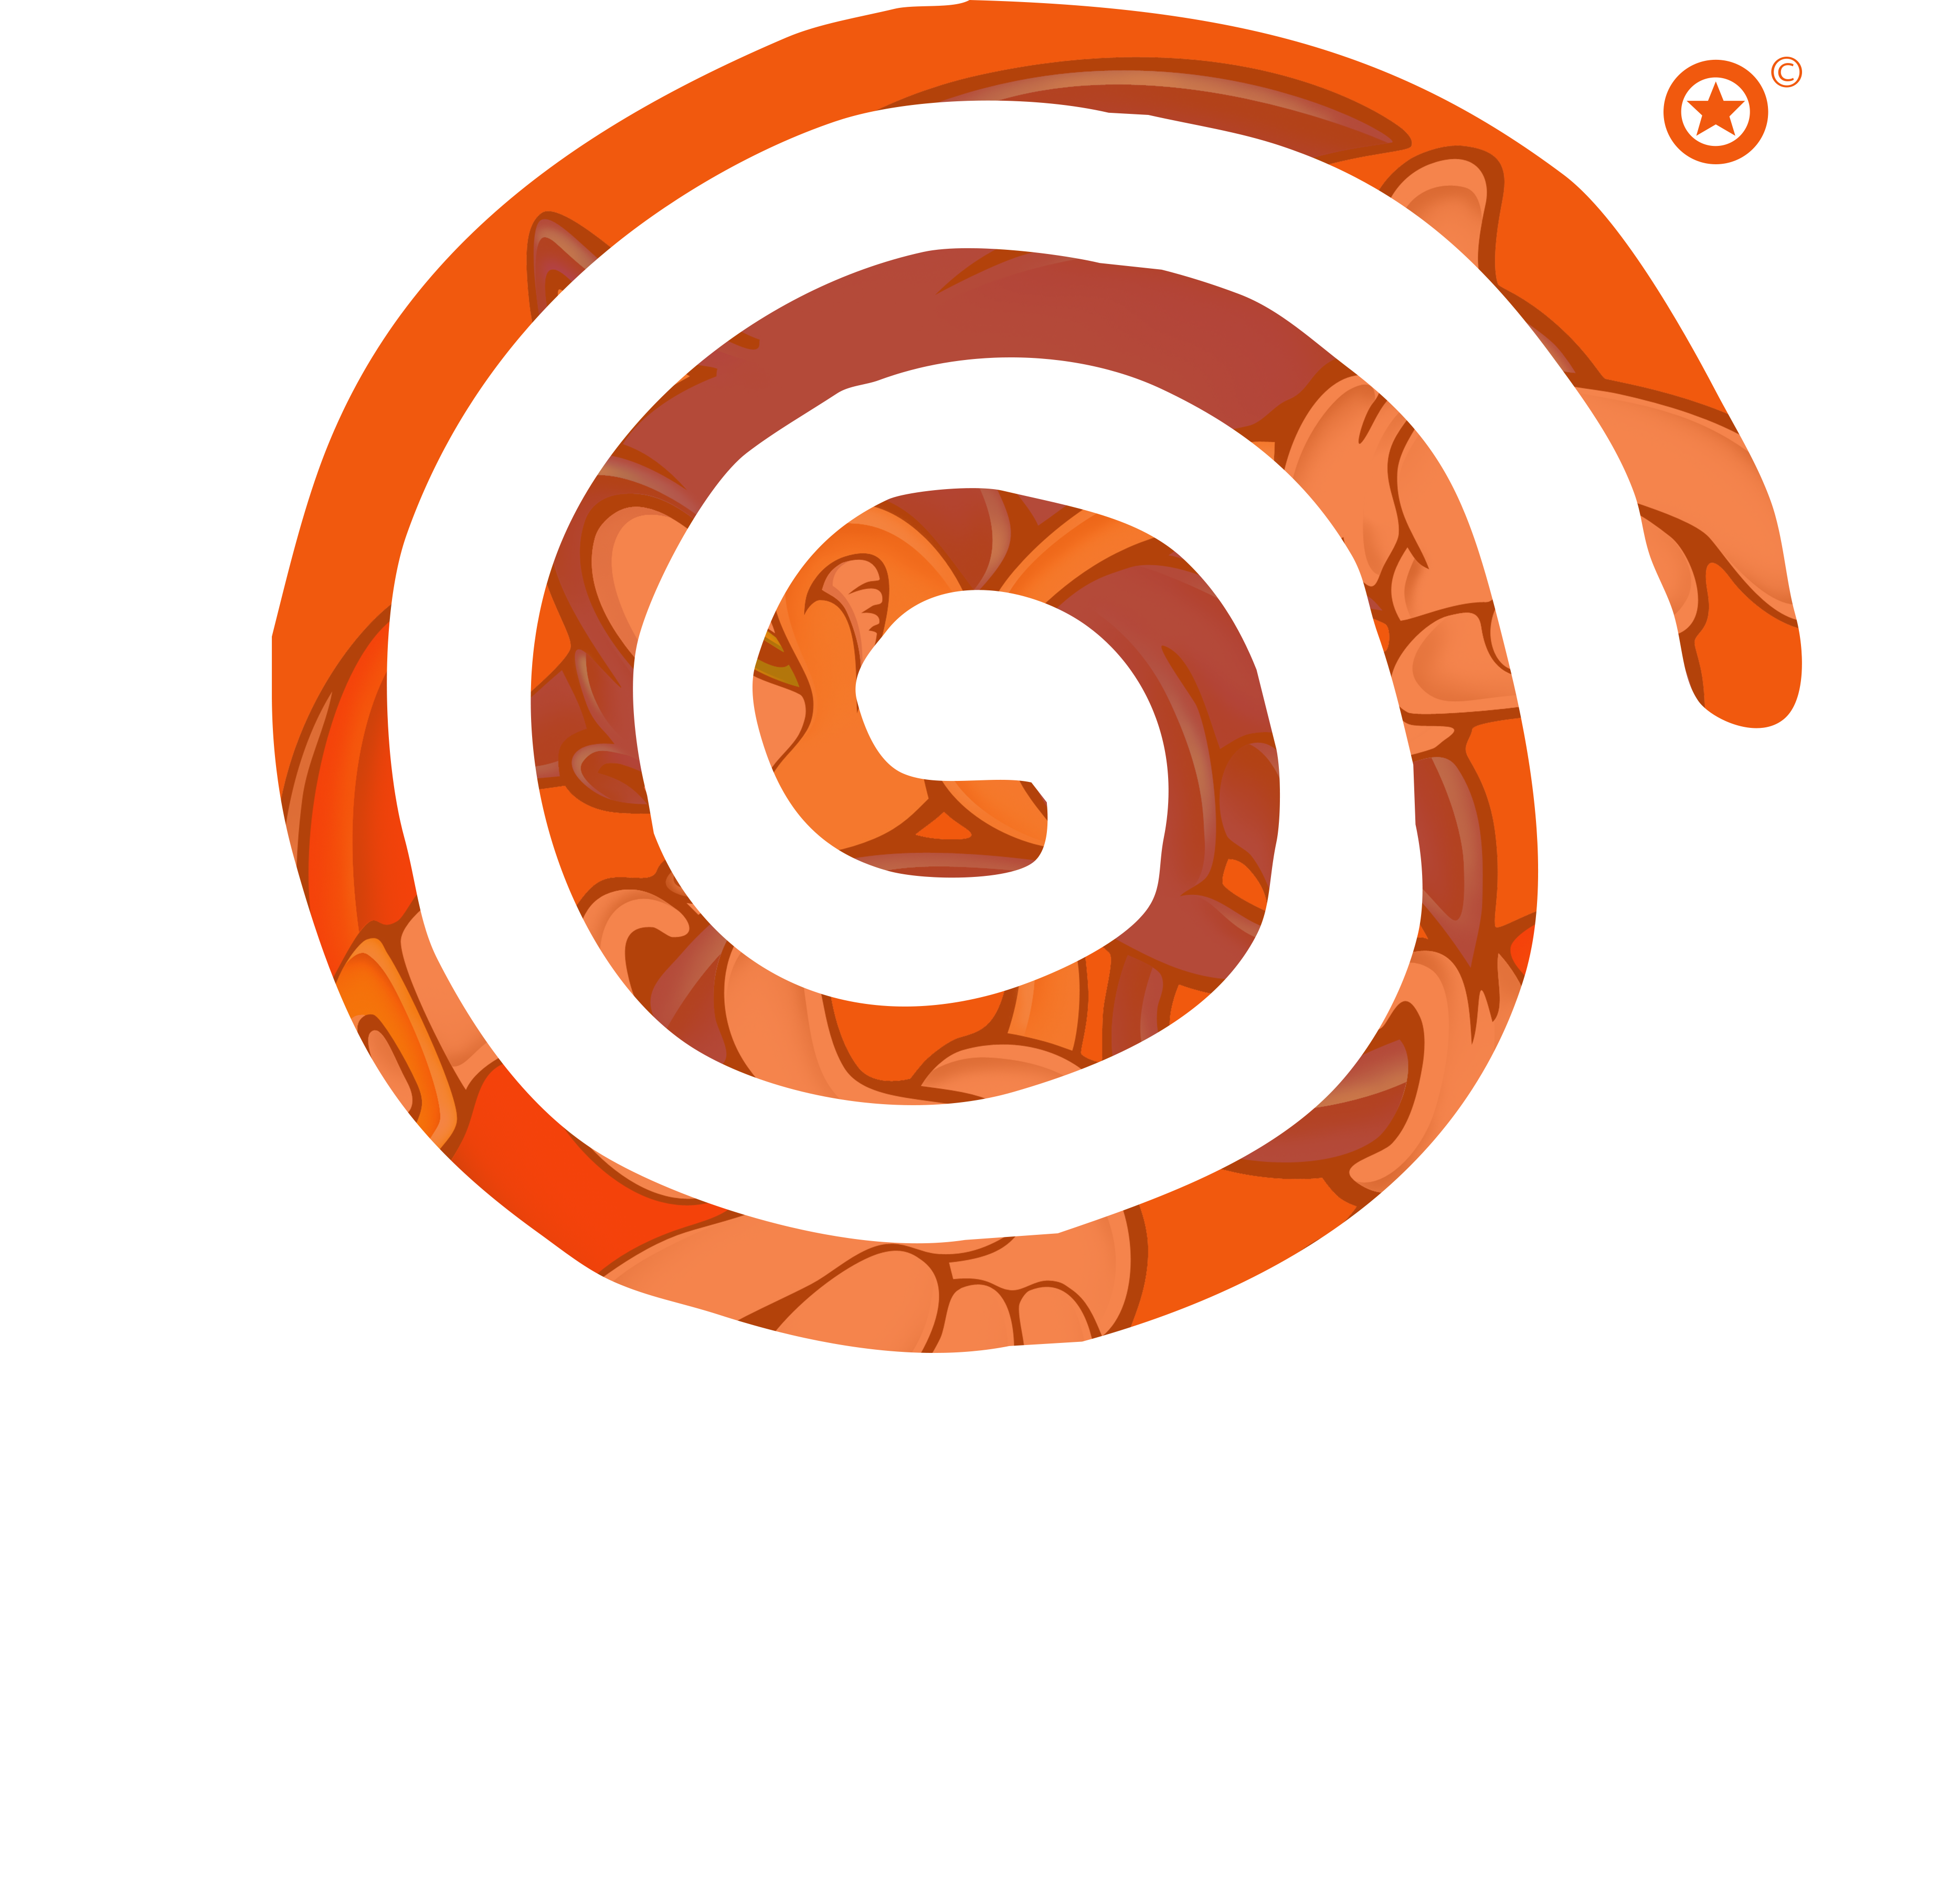 Dreamcast 17th Anniversary Logo by NuryRush